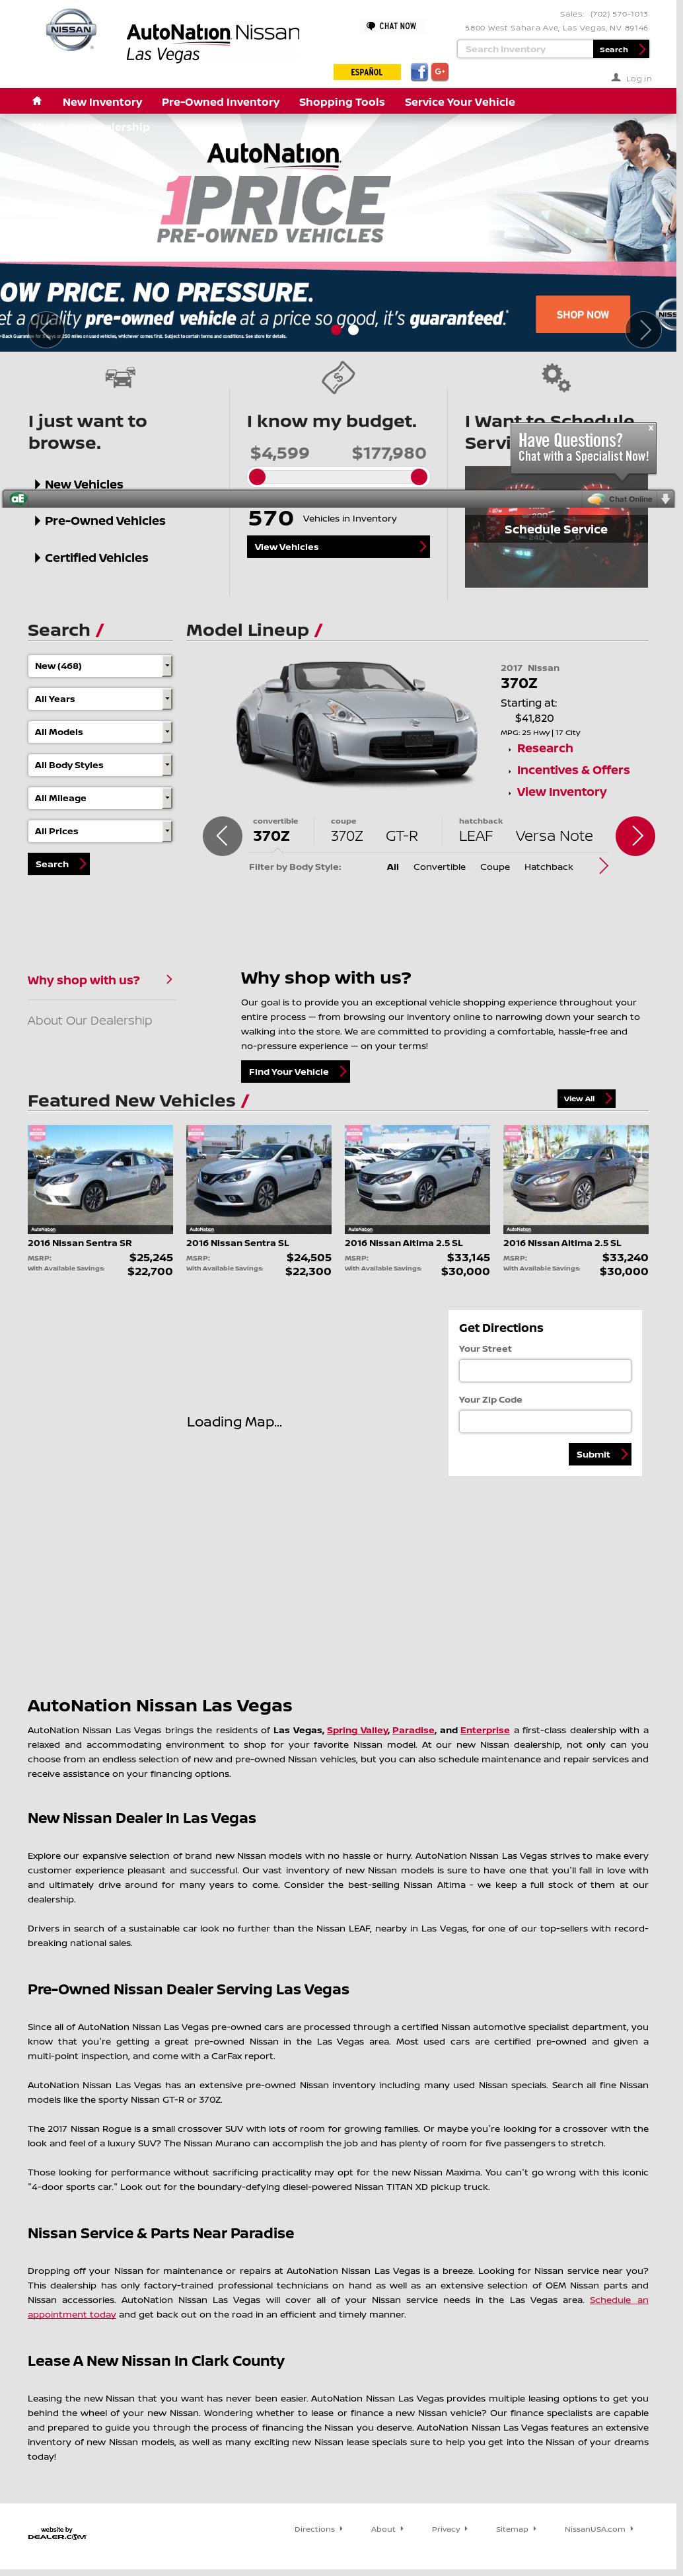 Autonation Nissan Las Vegas Website History